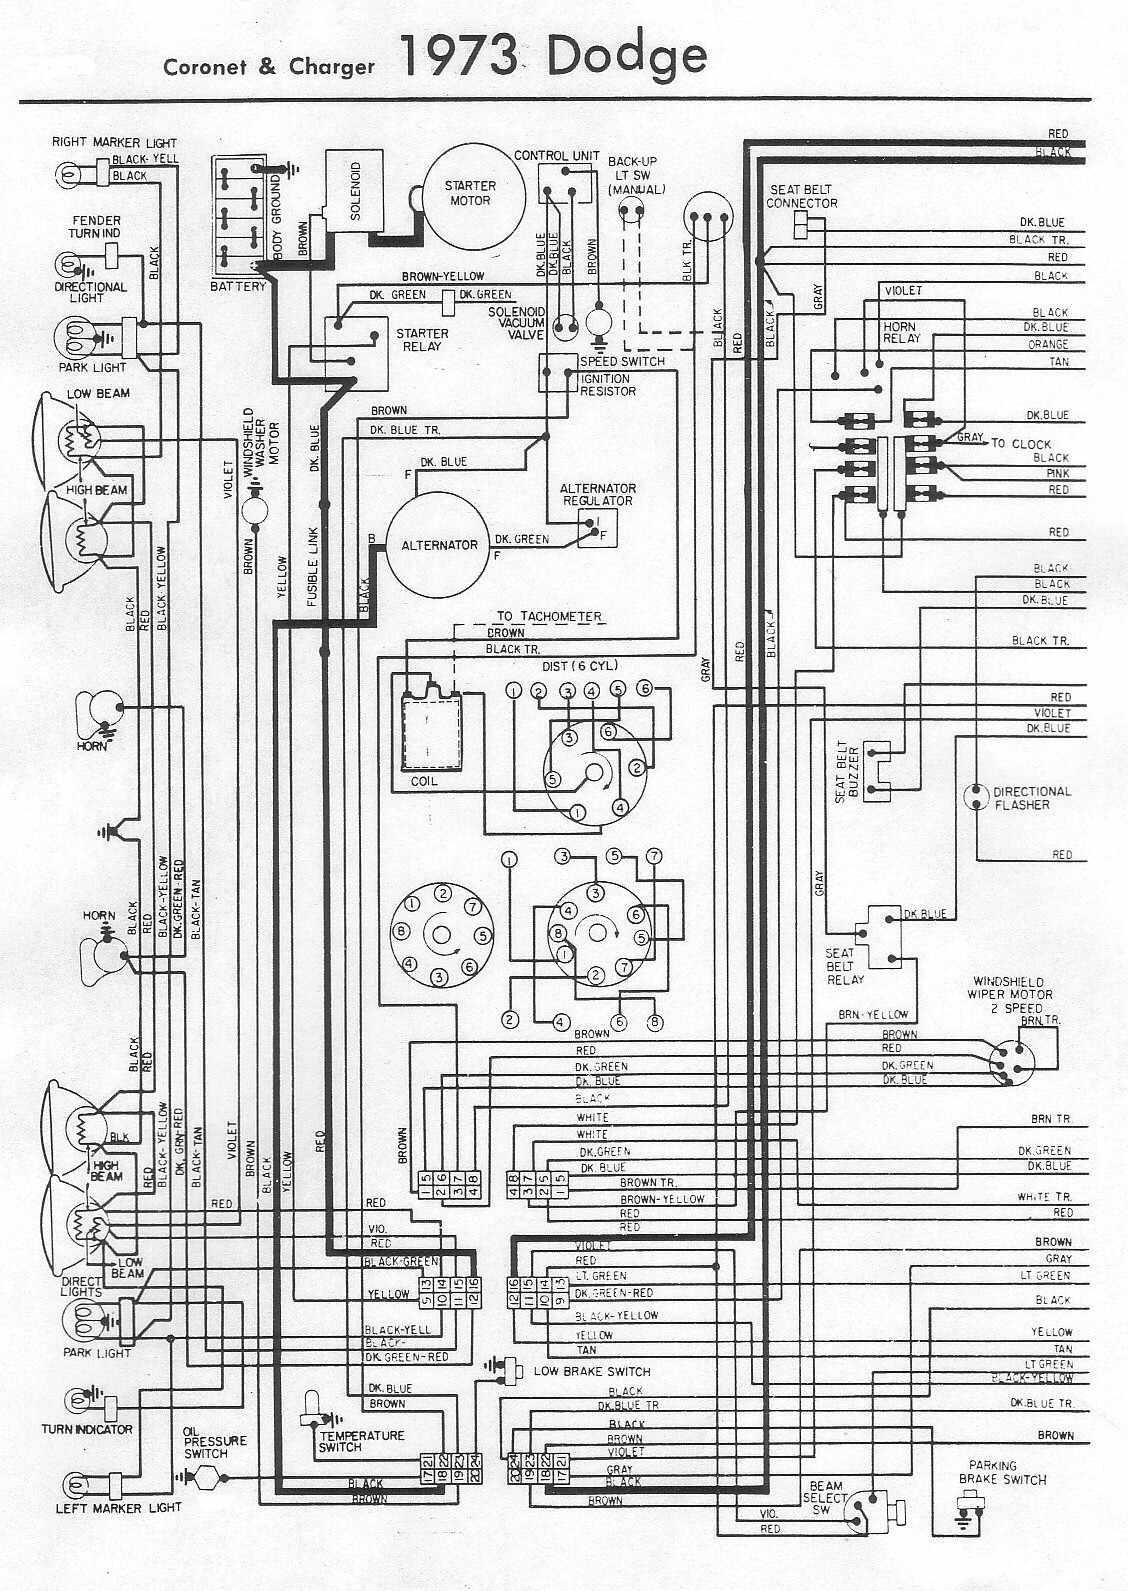 1973 dodge challenger fuse box diagram